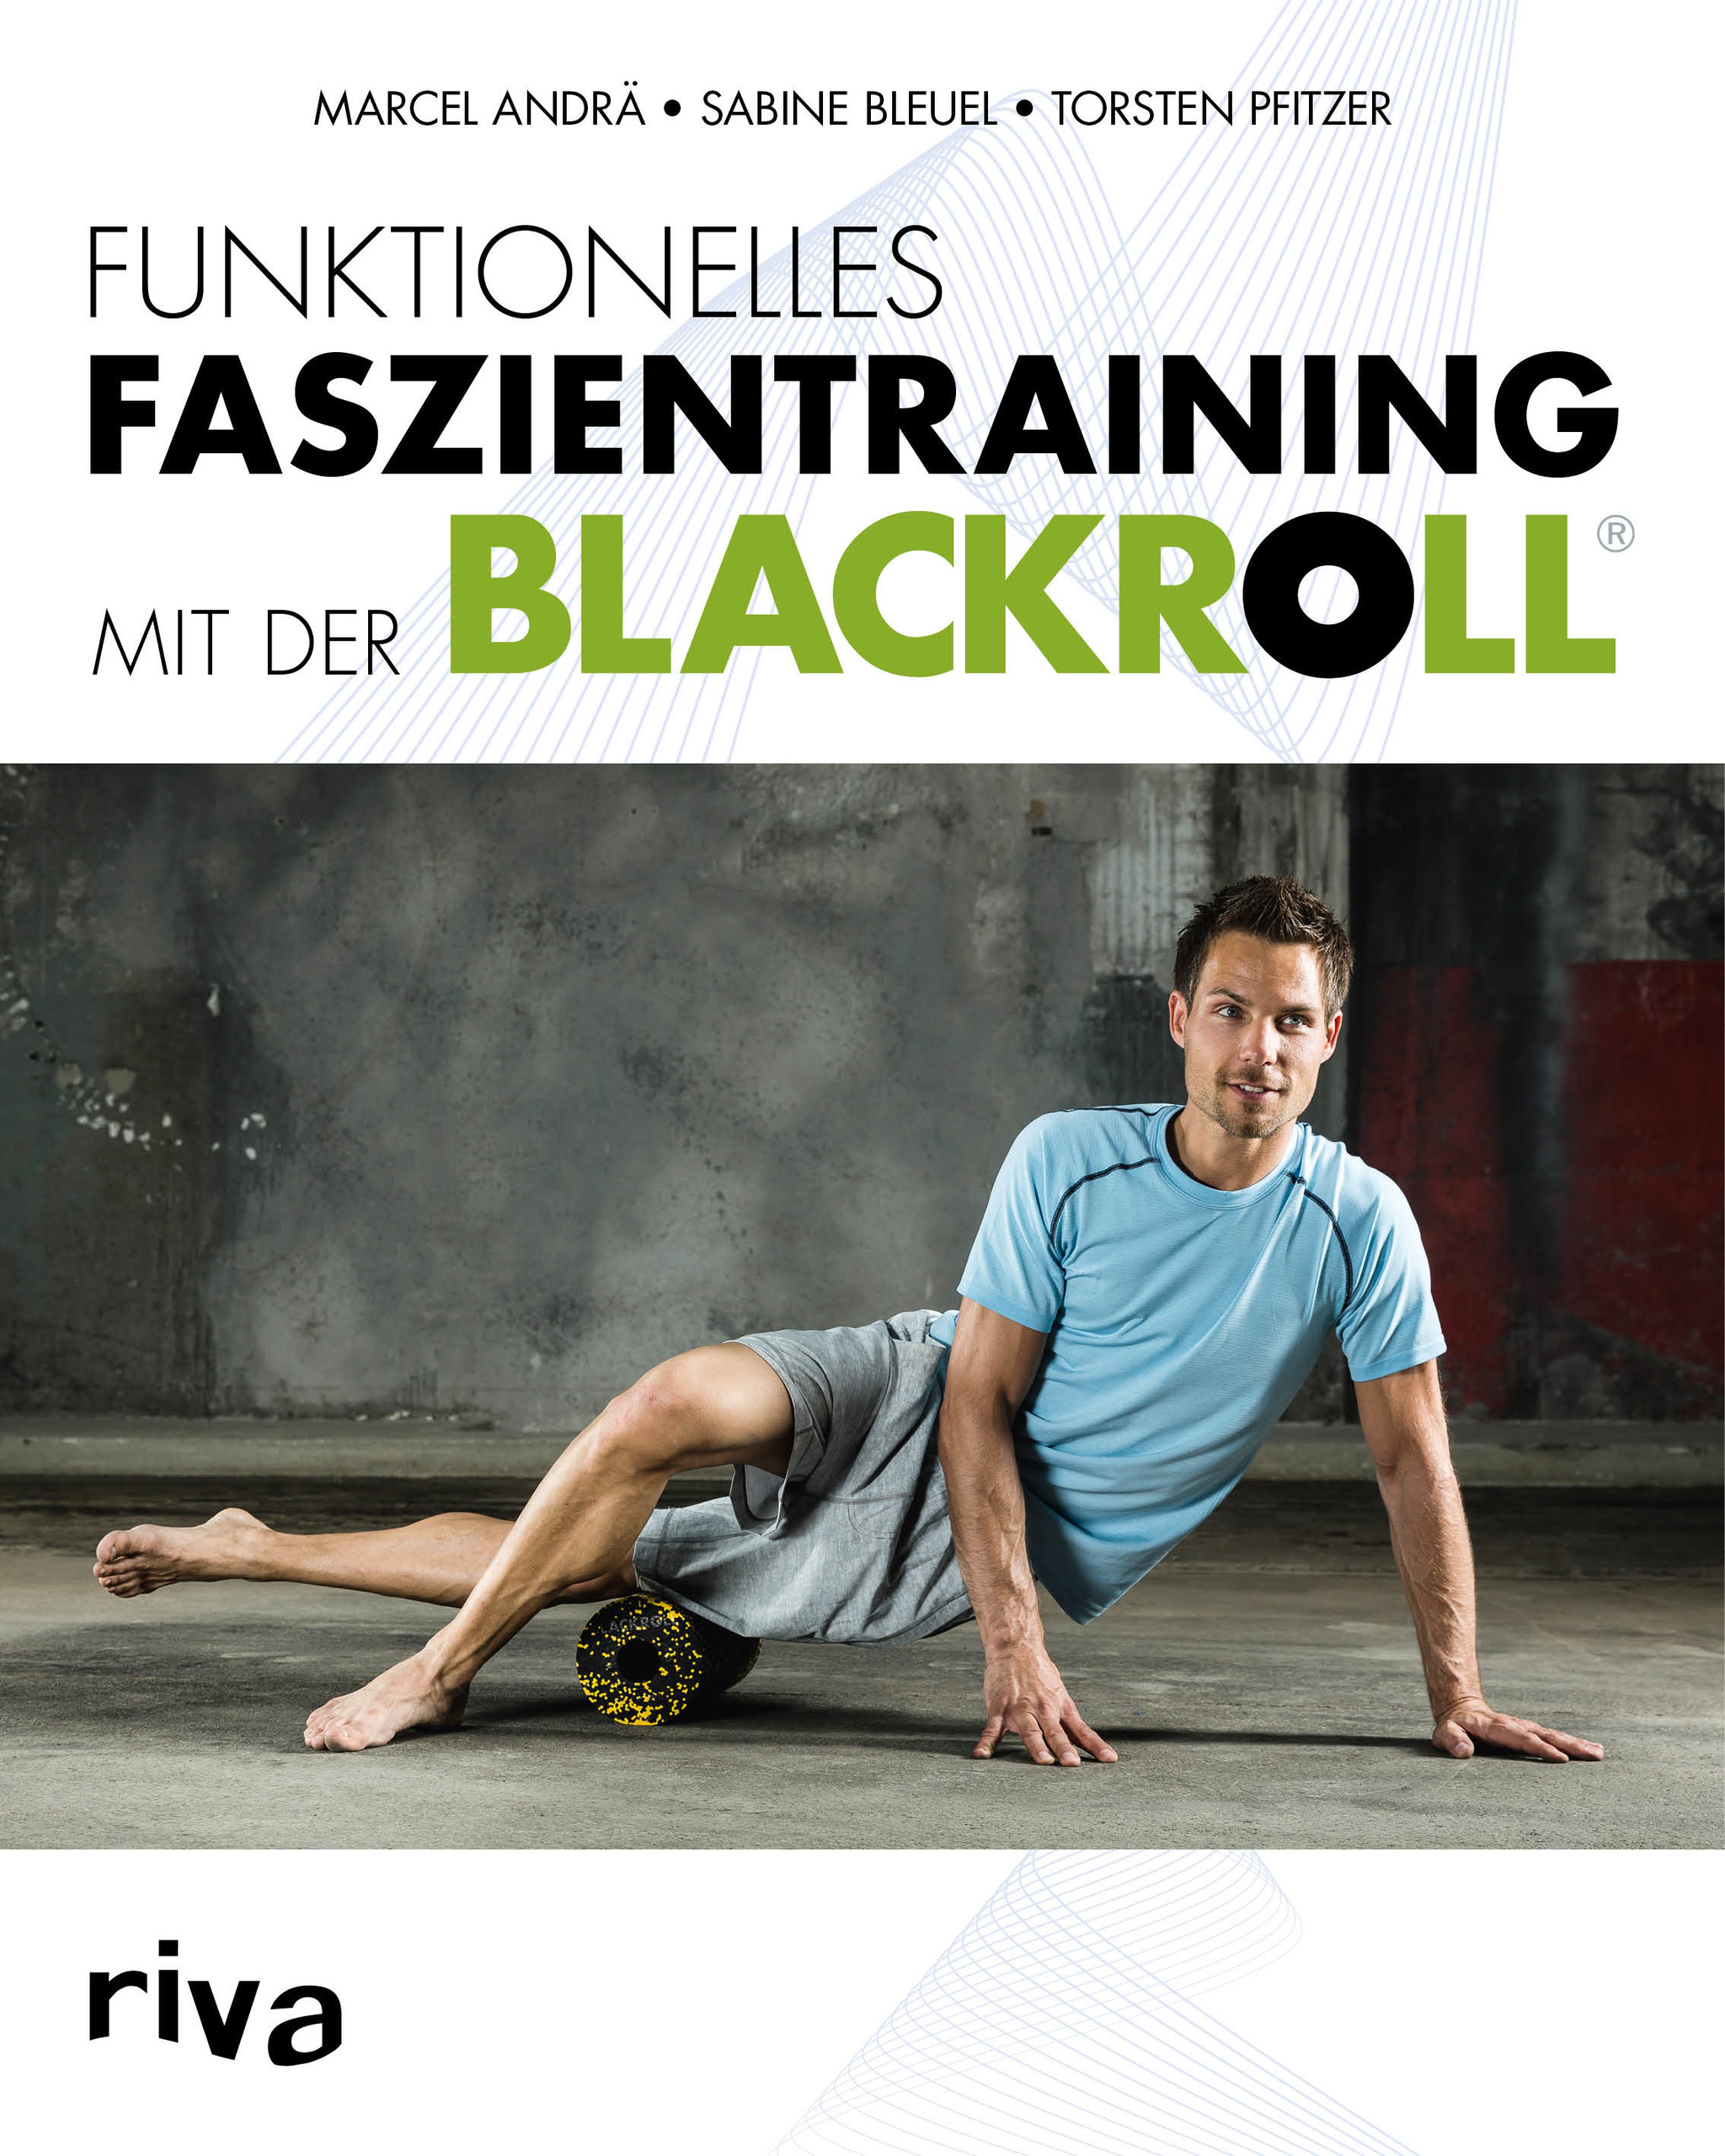 Funktionelles Faszientraining mit der Blackroll - Marcel Andrä [Broschiert]